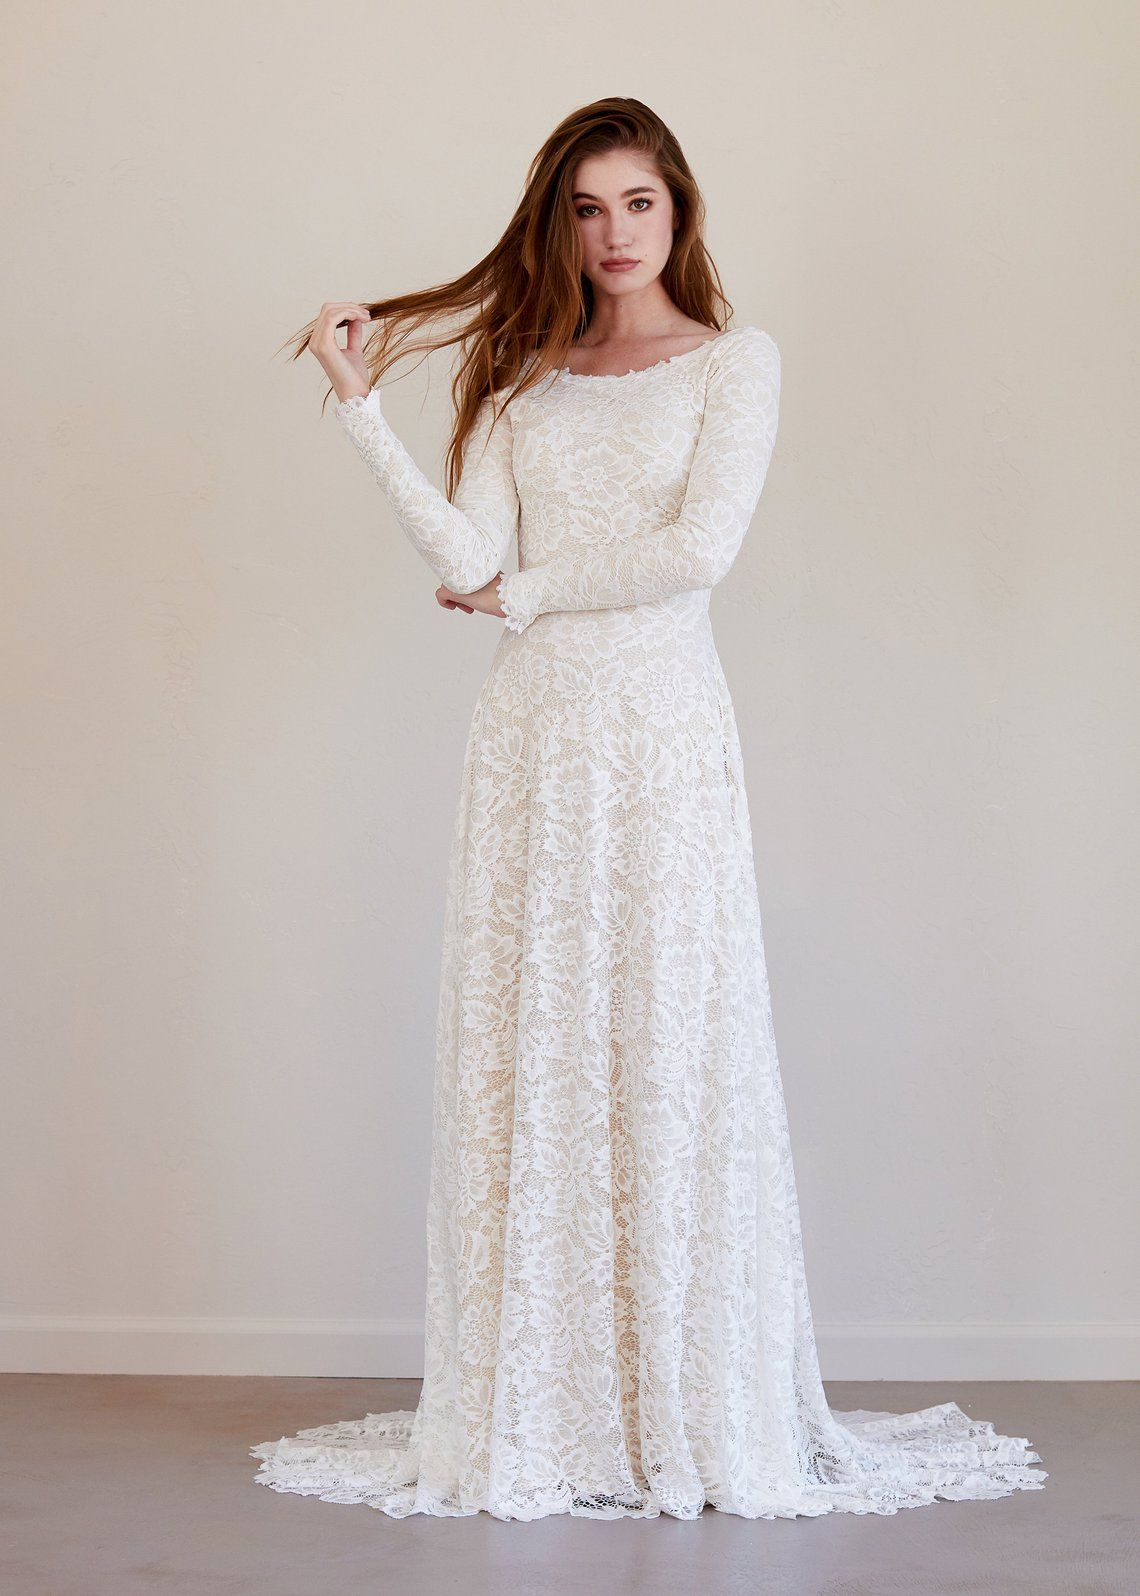 Long Sleeve Wedding Dress, Lace Long Sleeves, Boho Wedding